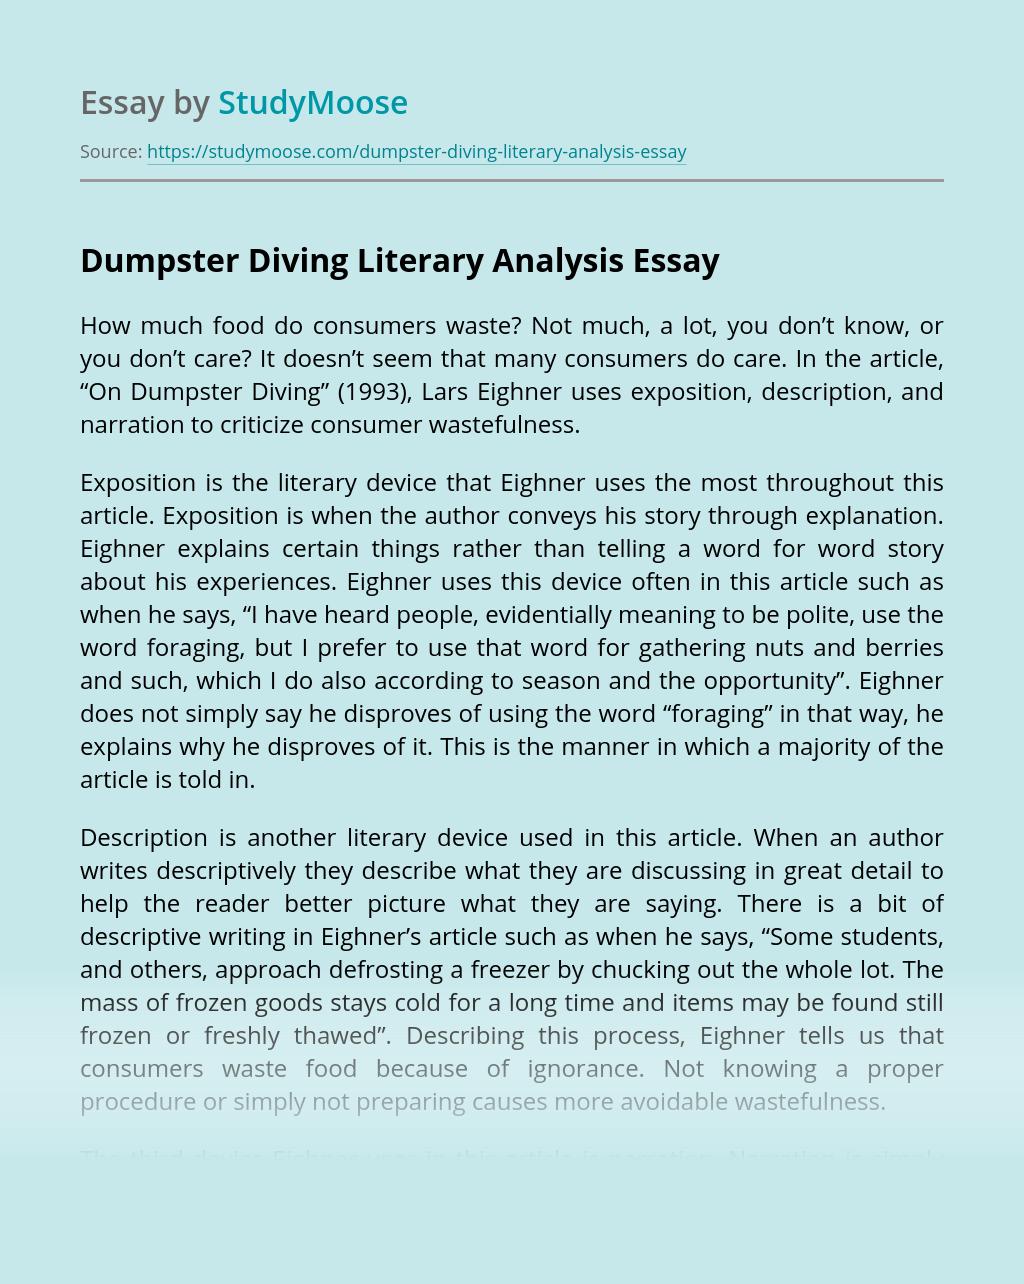 Dumpster Diving Literary Analysis